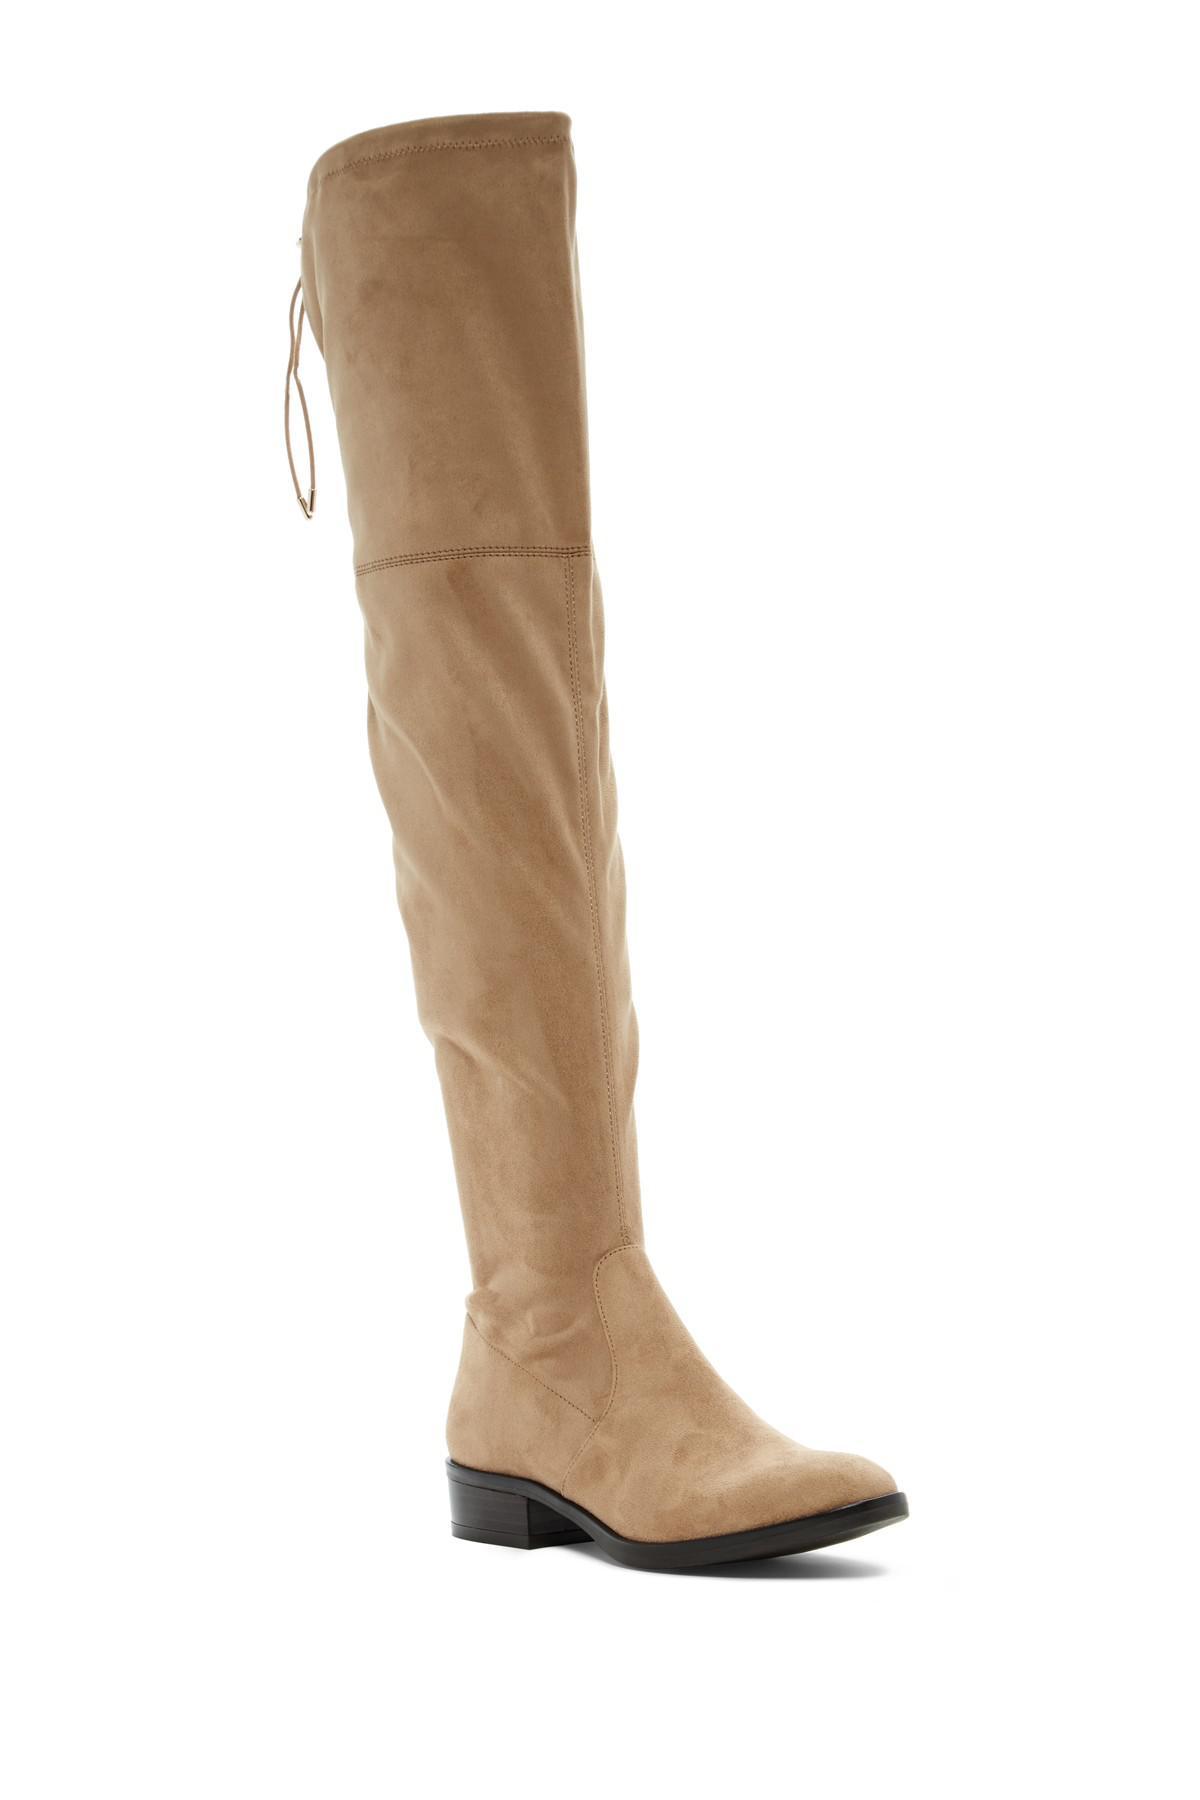 81069fa9f19 Lyst - Sam Edelman Paloma Over-the-knee Boot